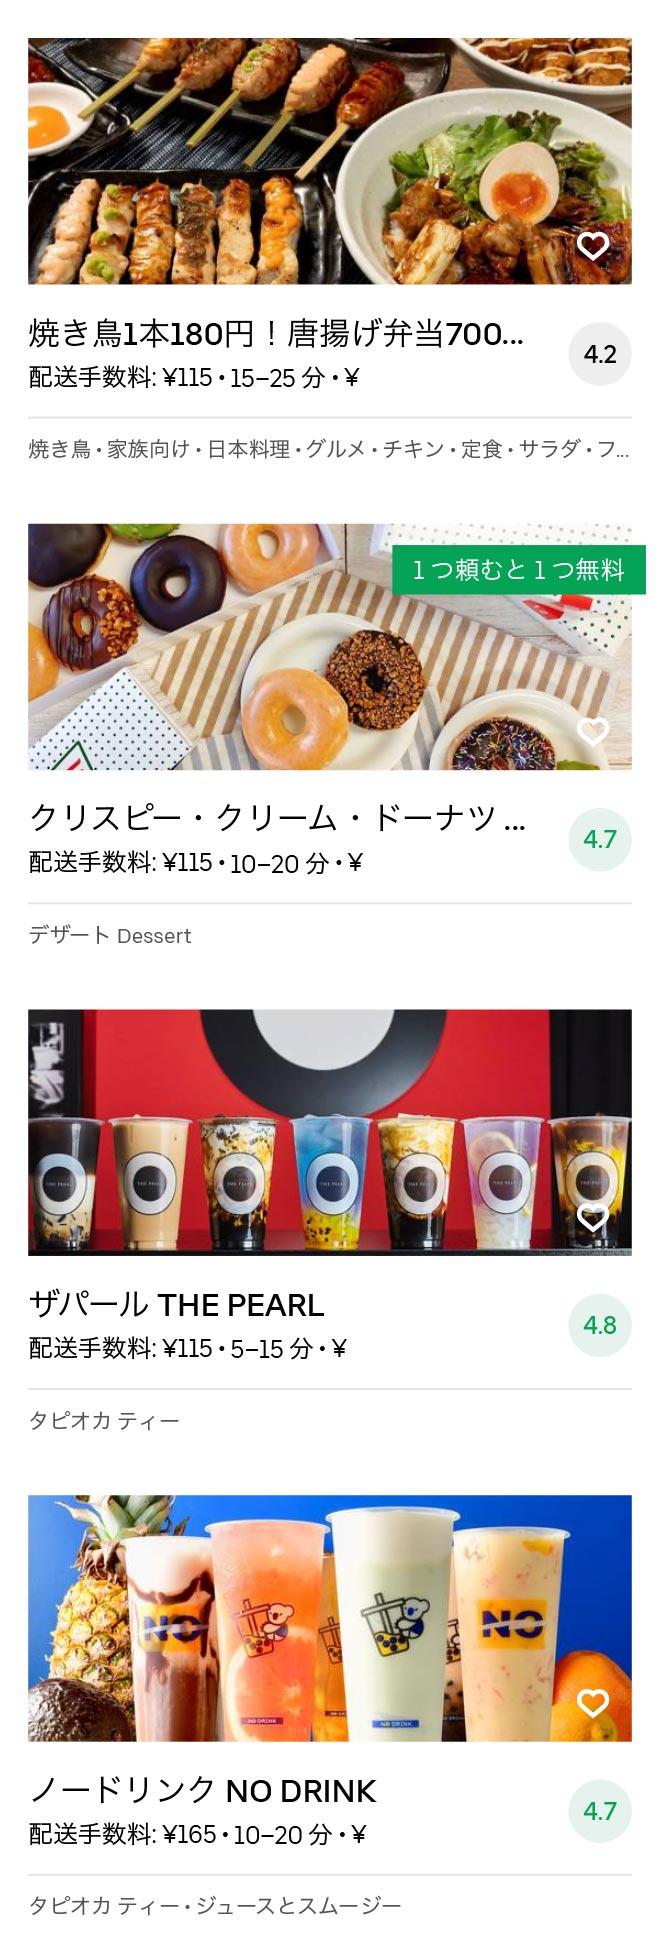 Hatioji menu 2010 12